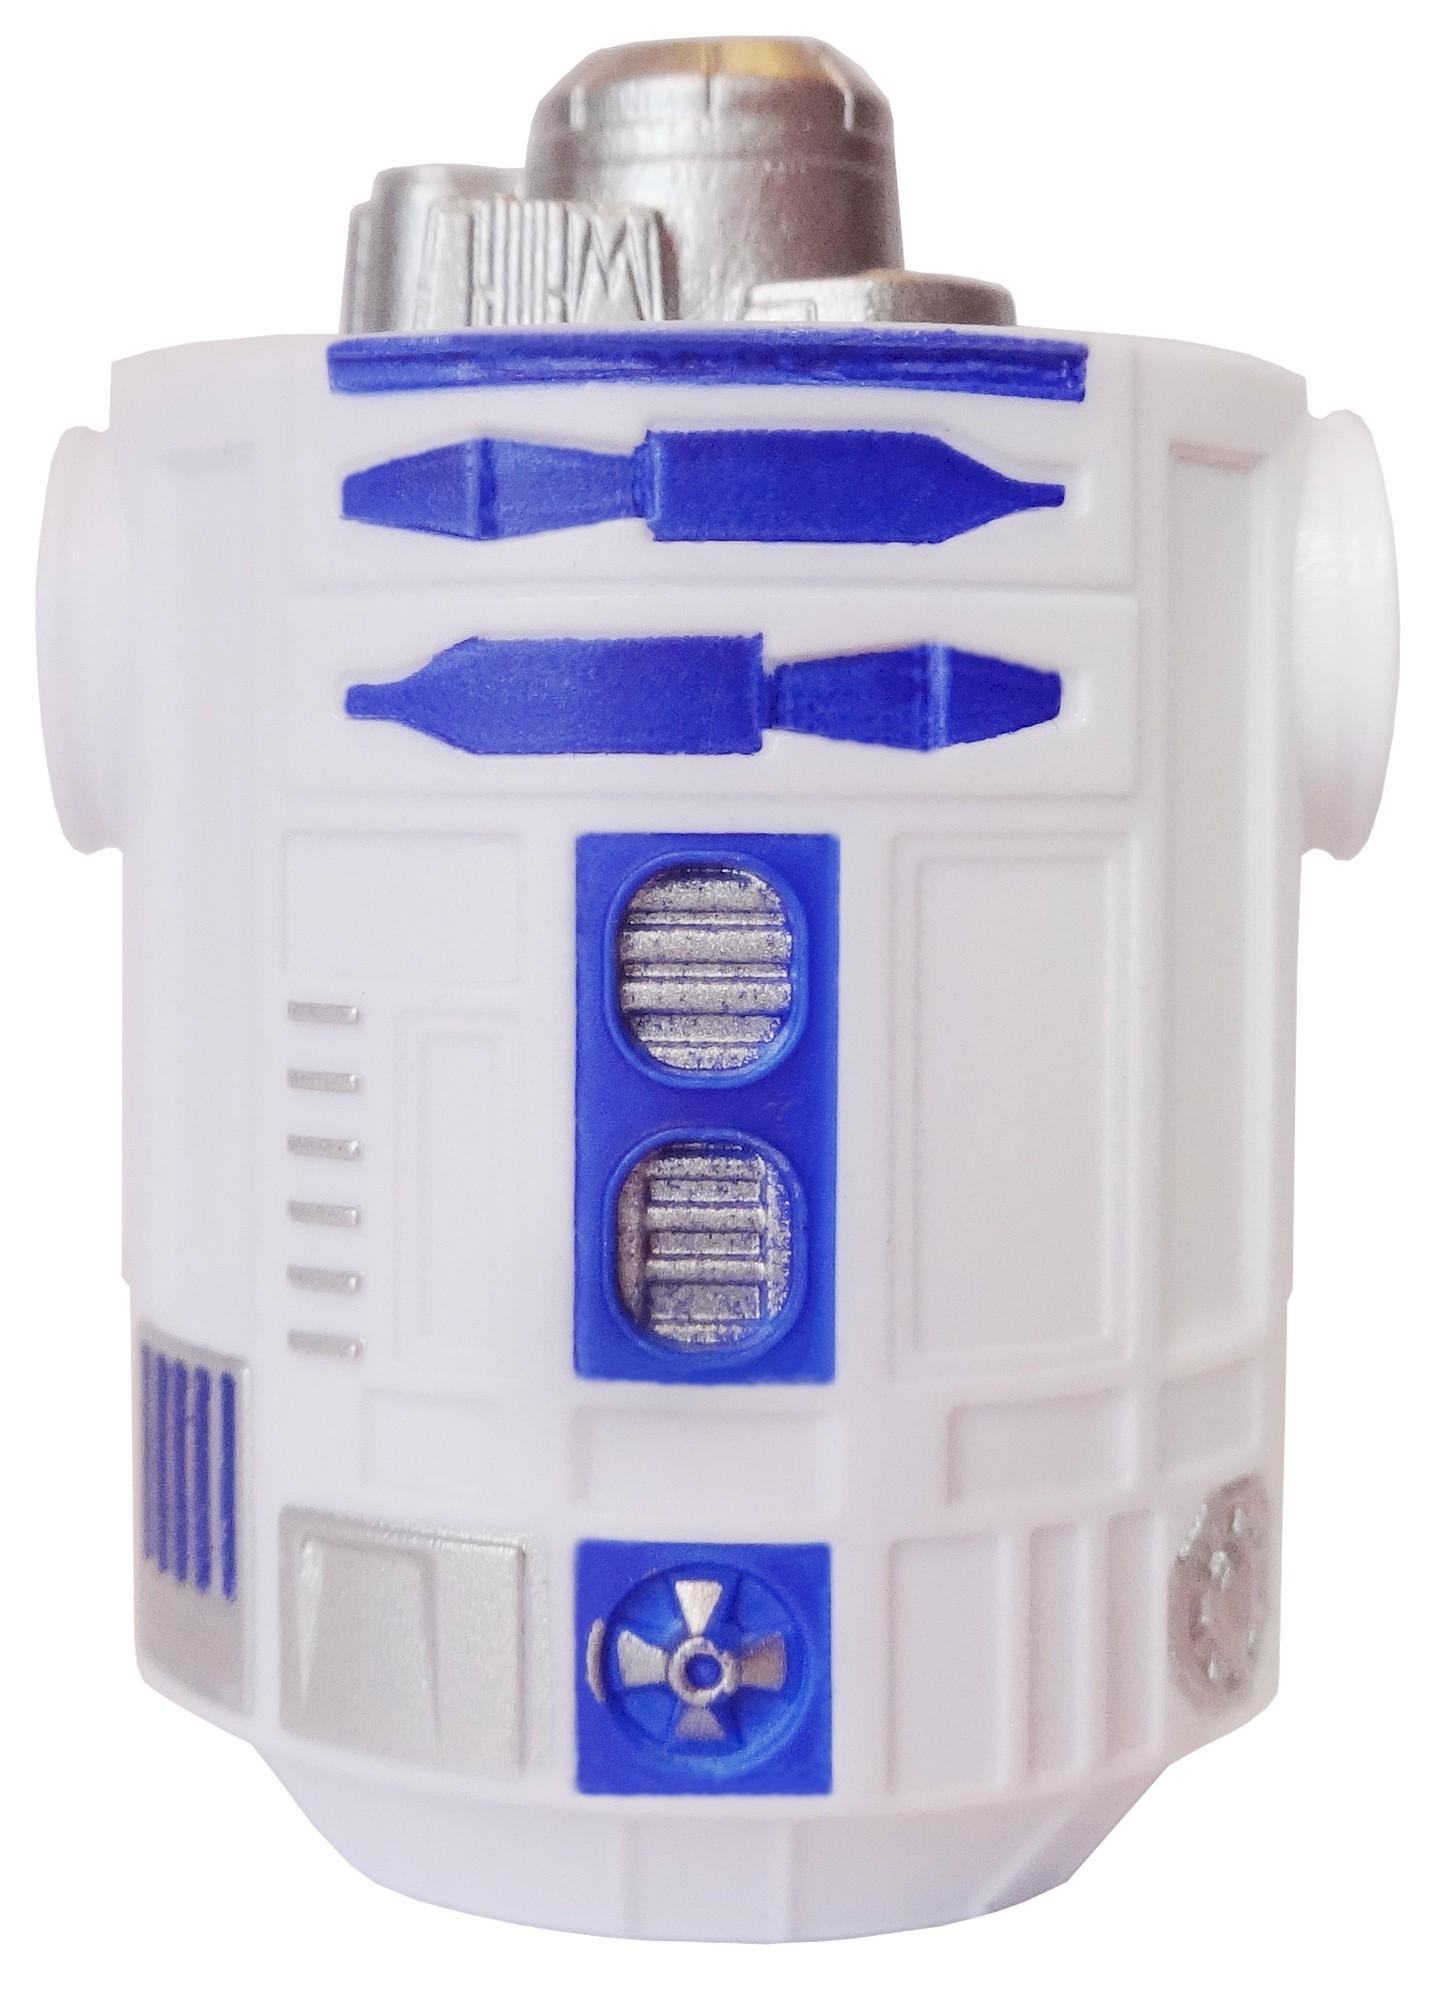 White & Blue Astromech Droid Body ~ Series 2 from Disney Star Wars Build-A-Droid Factory © Dizdude.com